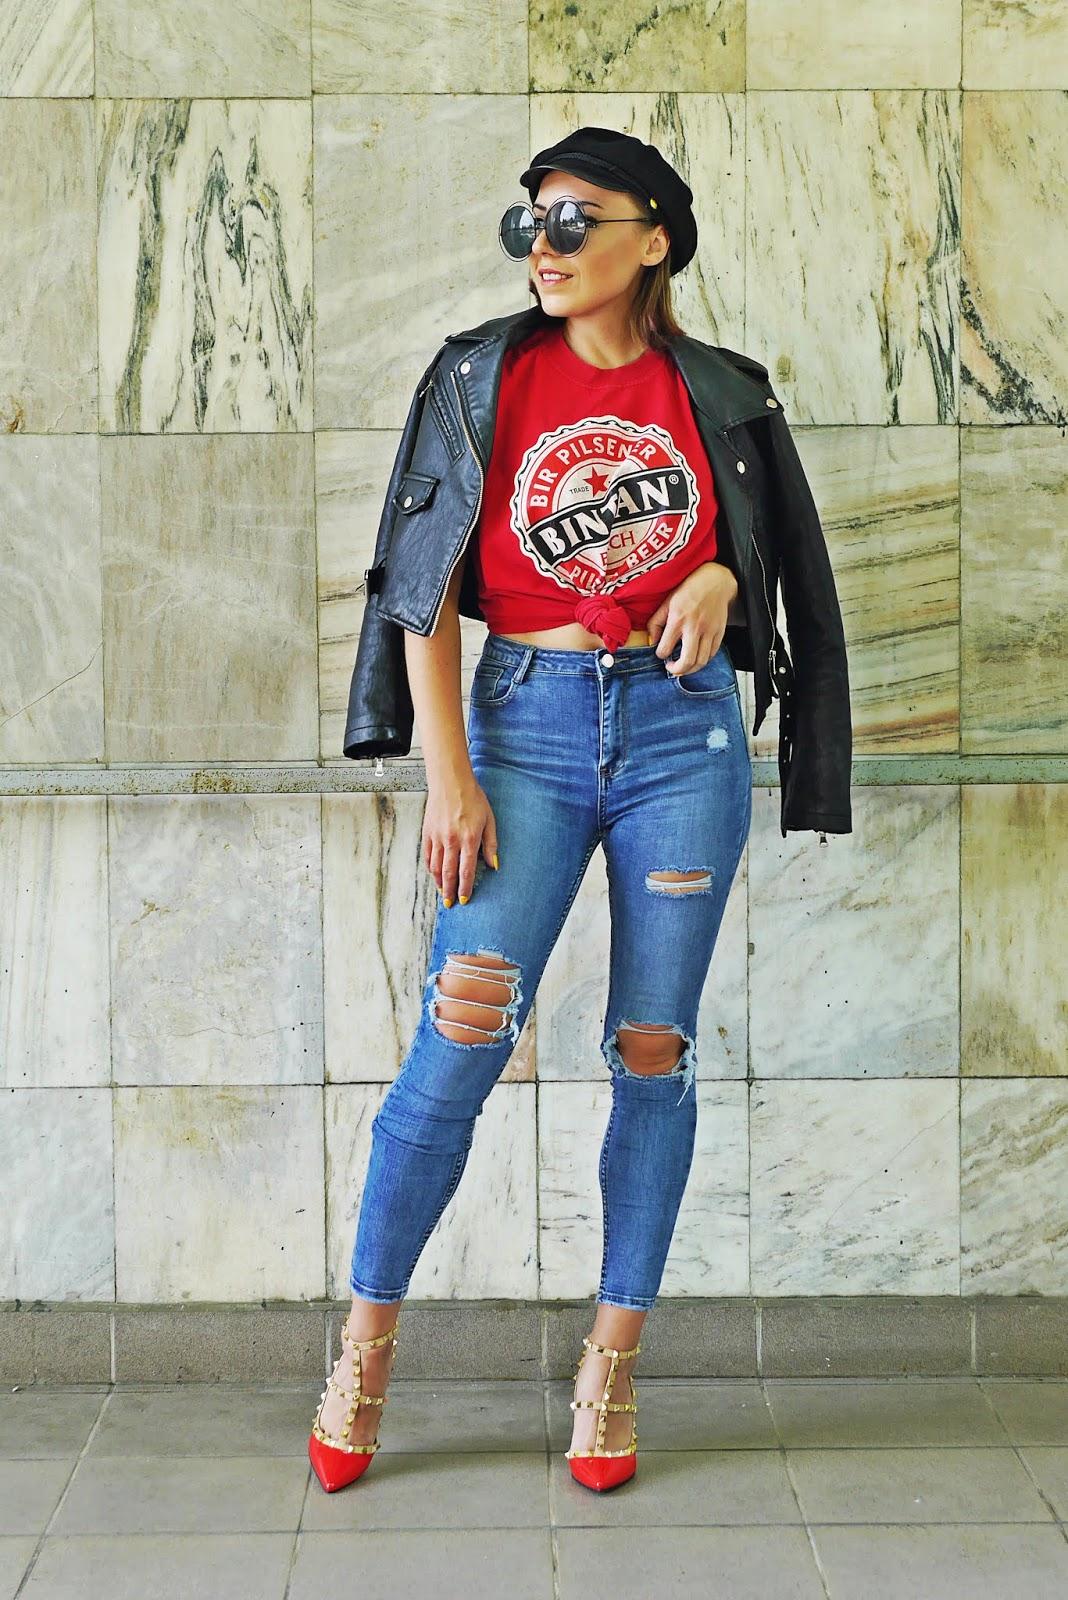 red heels christain lauboutin black biker jacket denim pants karyn blog modowy